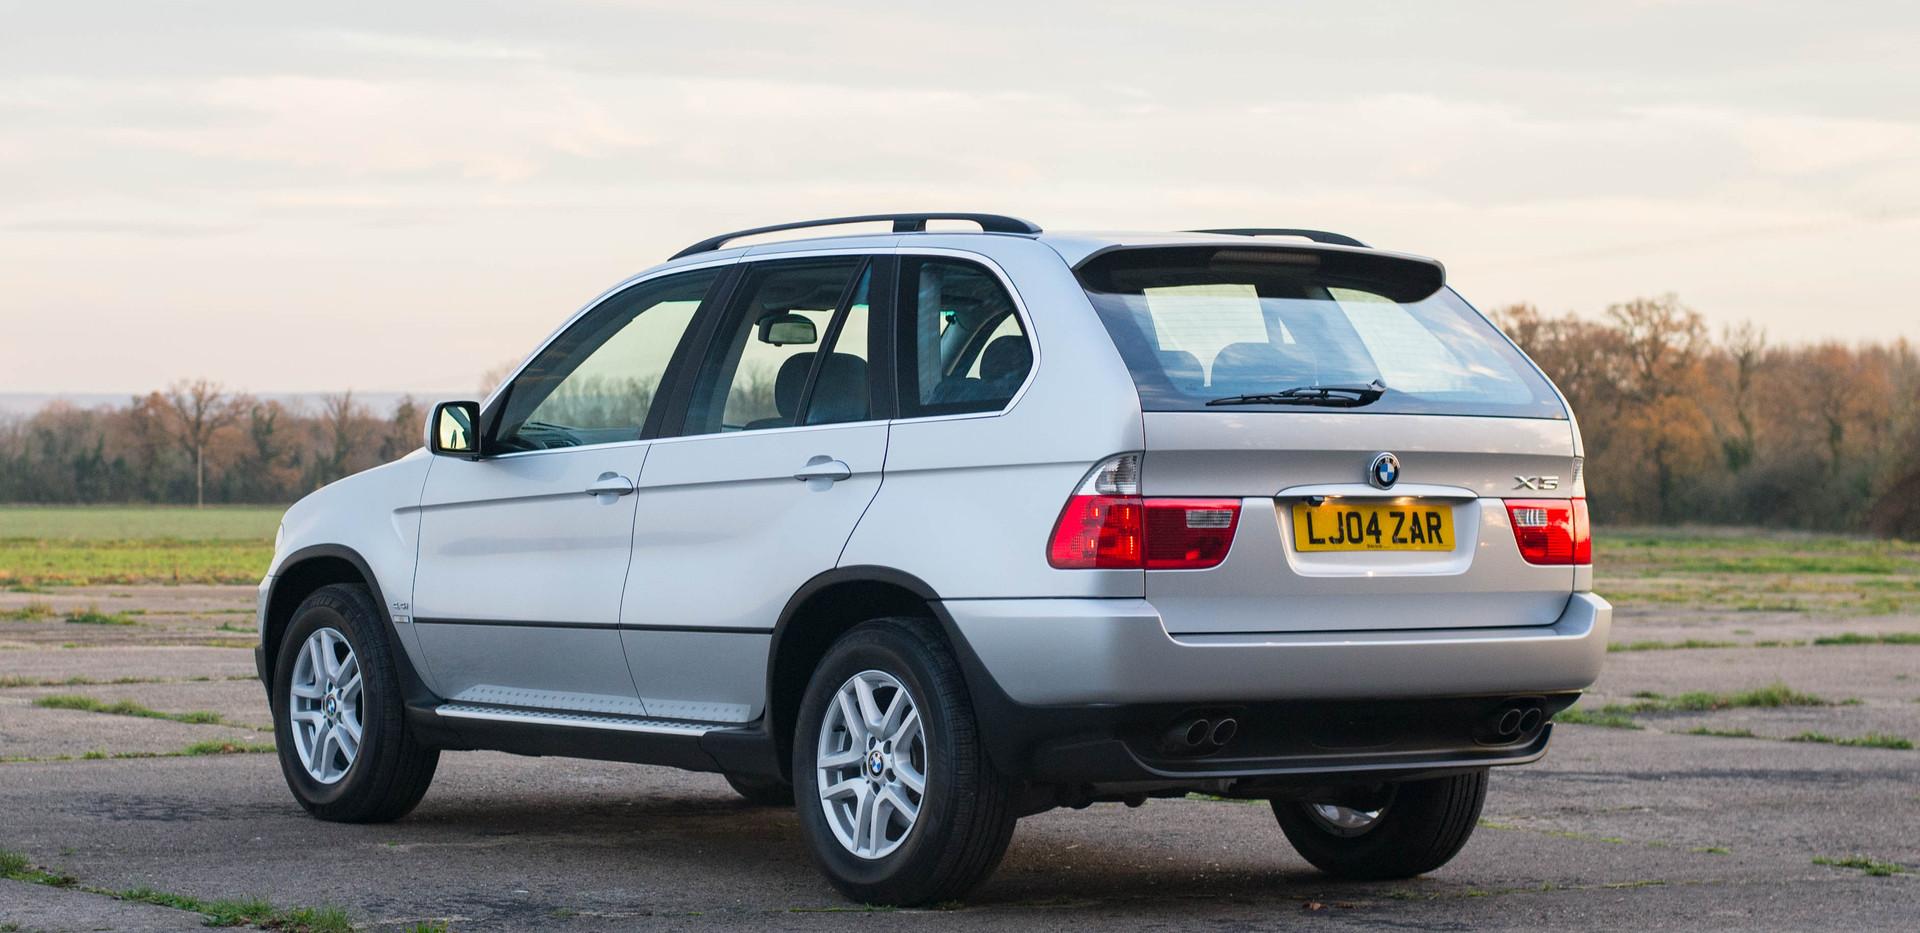 BMW E53 X5 4.4i For Sale UK London  (34